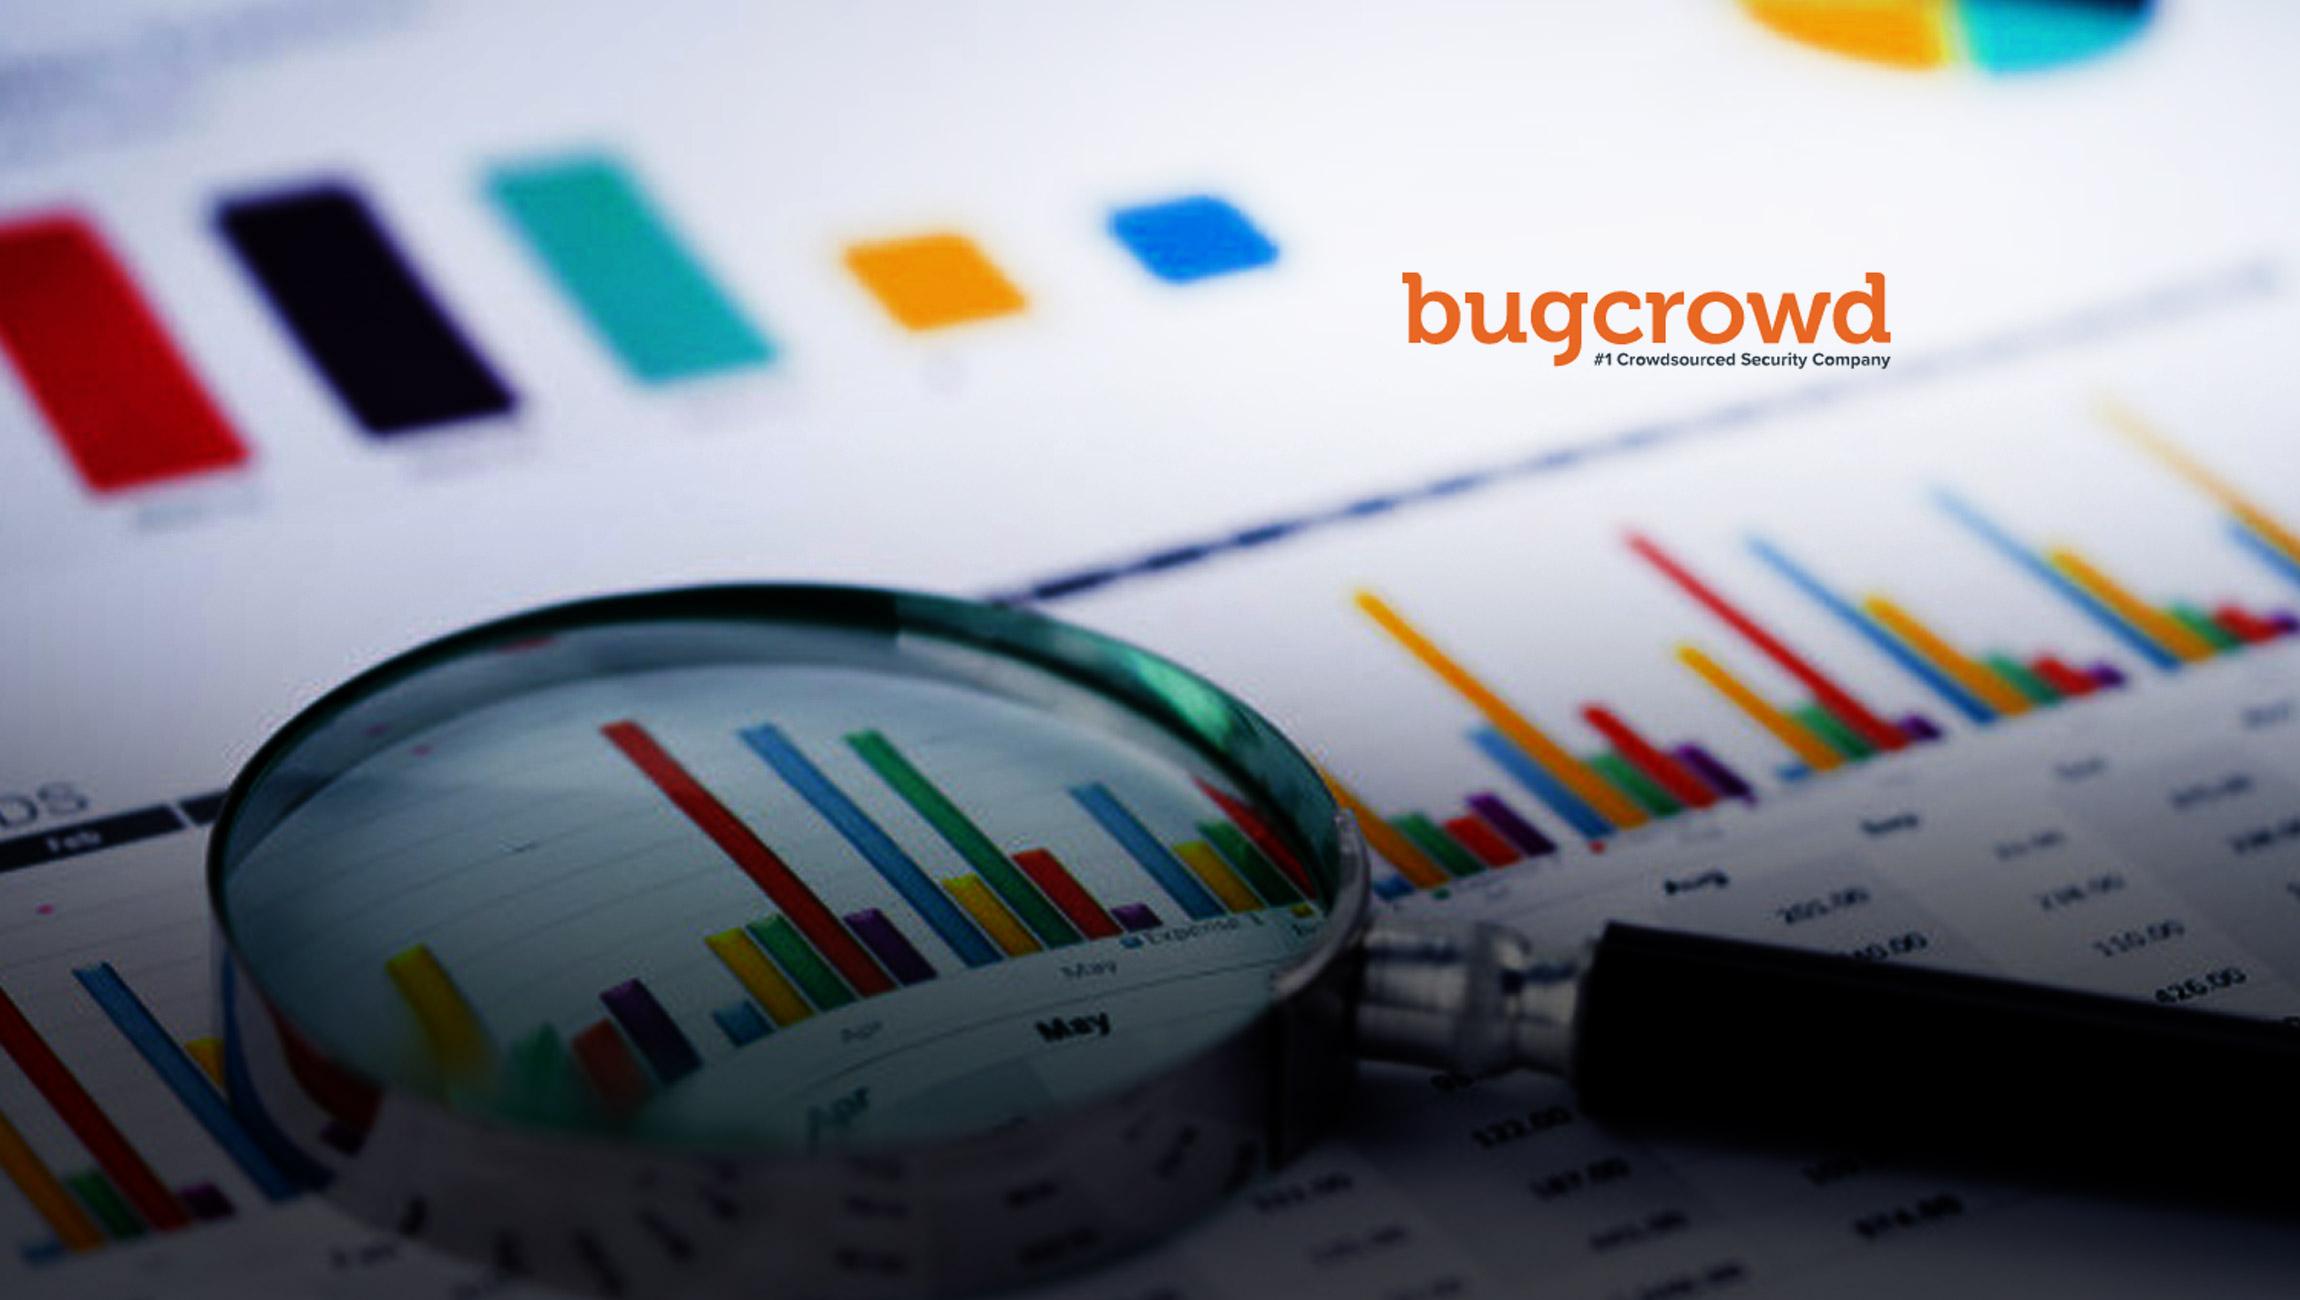 Bugcrowd Appoints David Castignola as Chief Revenue Officer